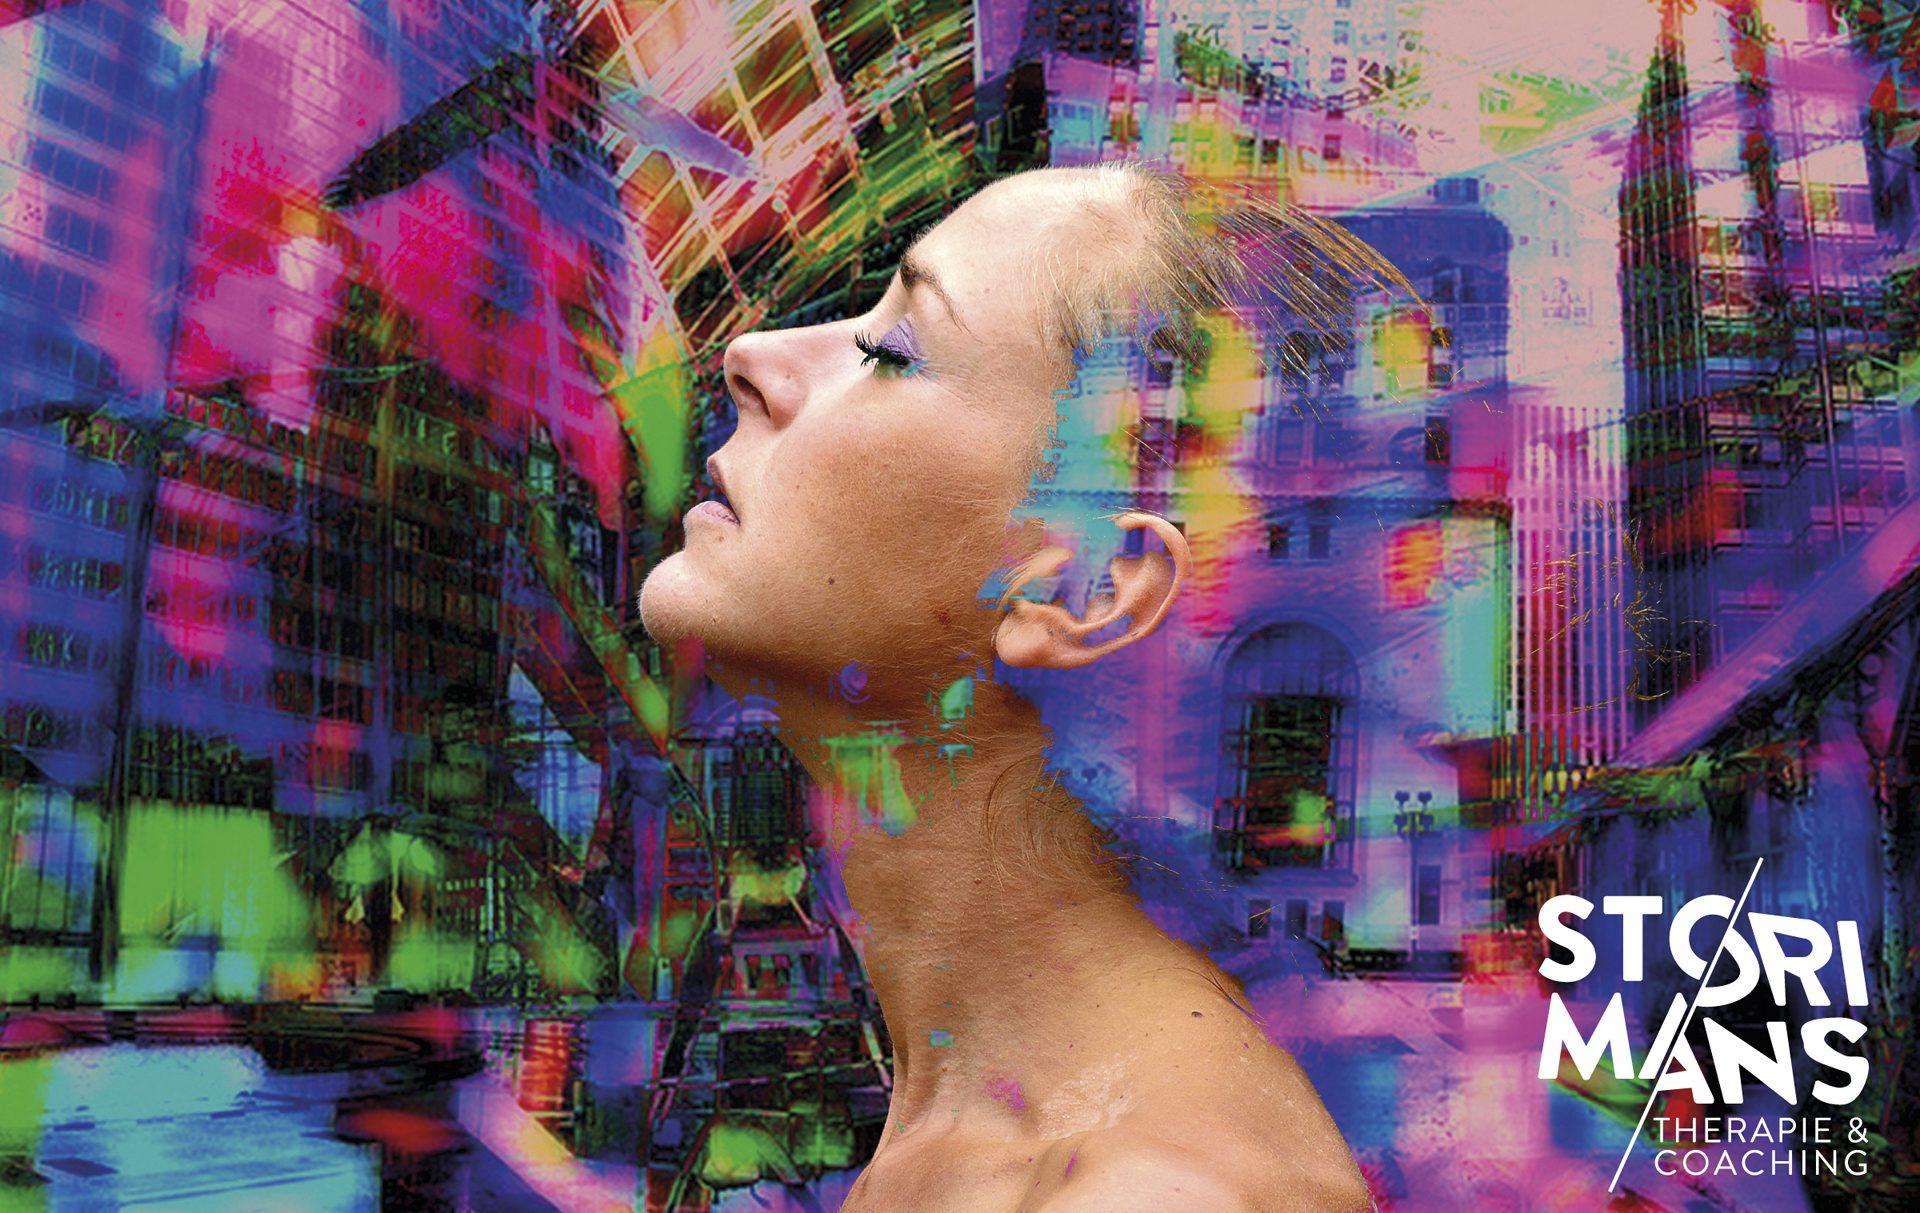 web profiel | Storimans Therapie